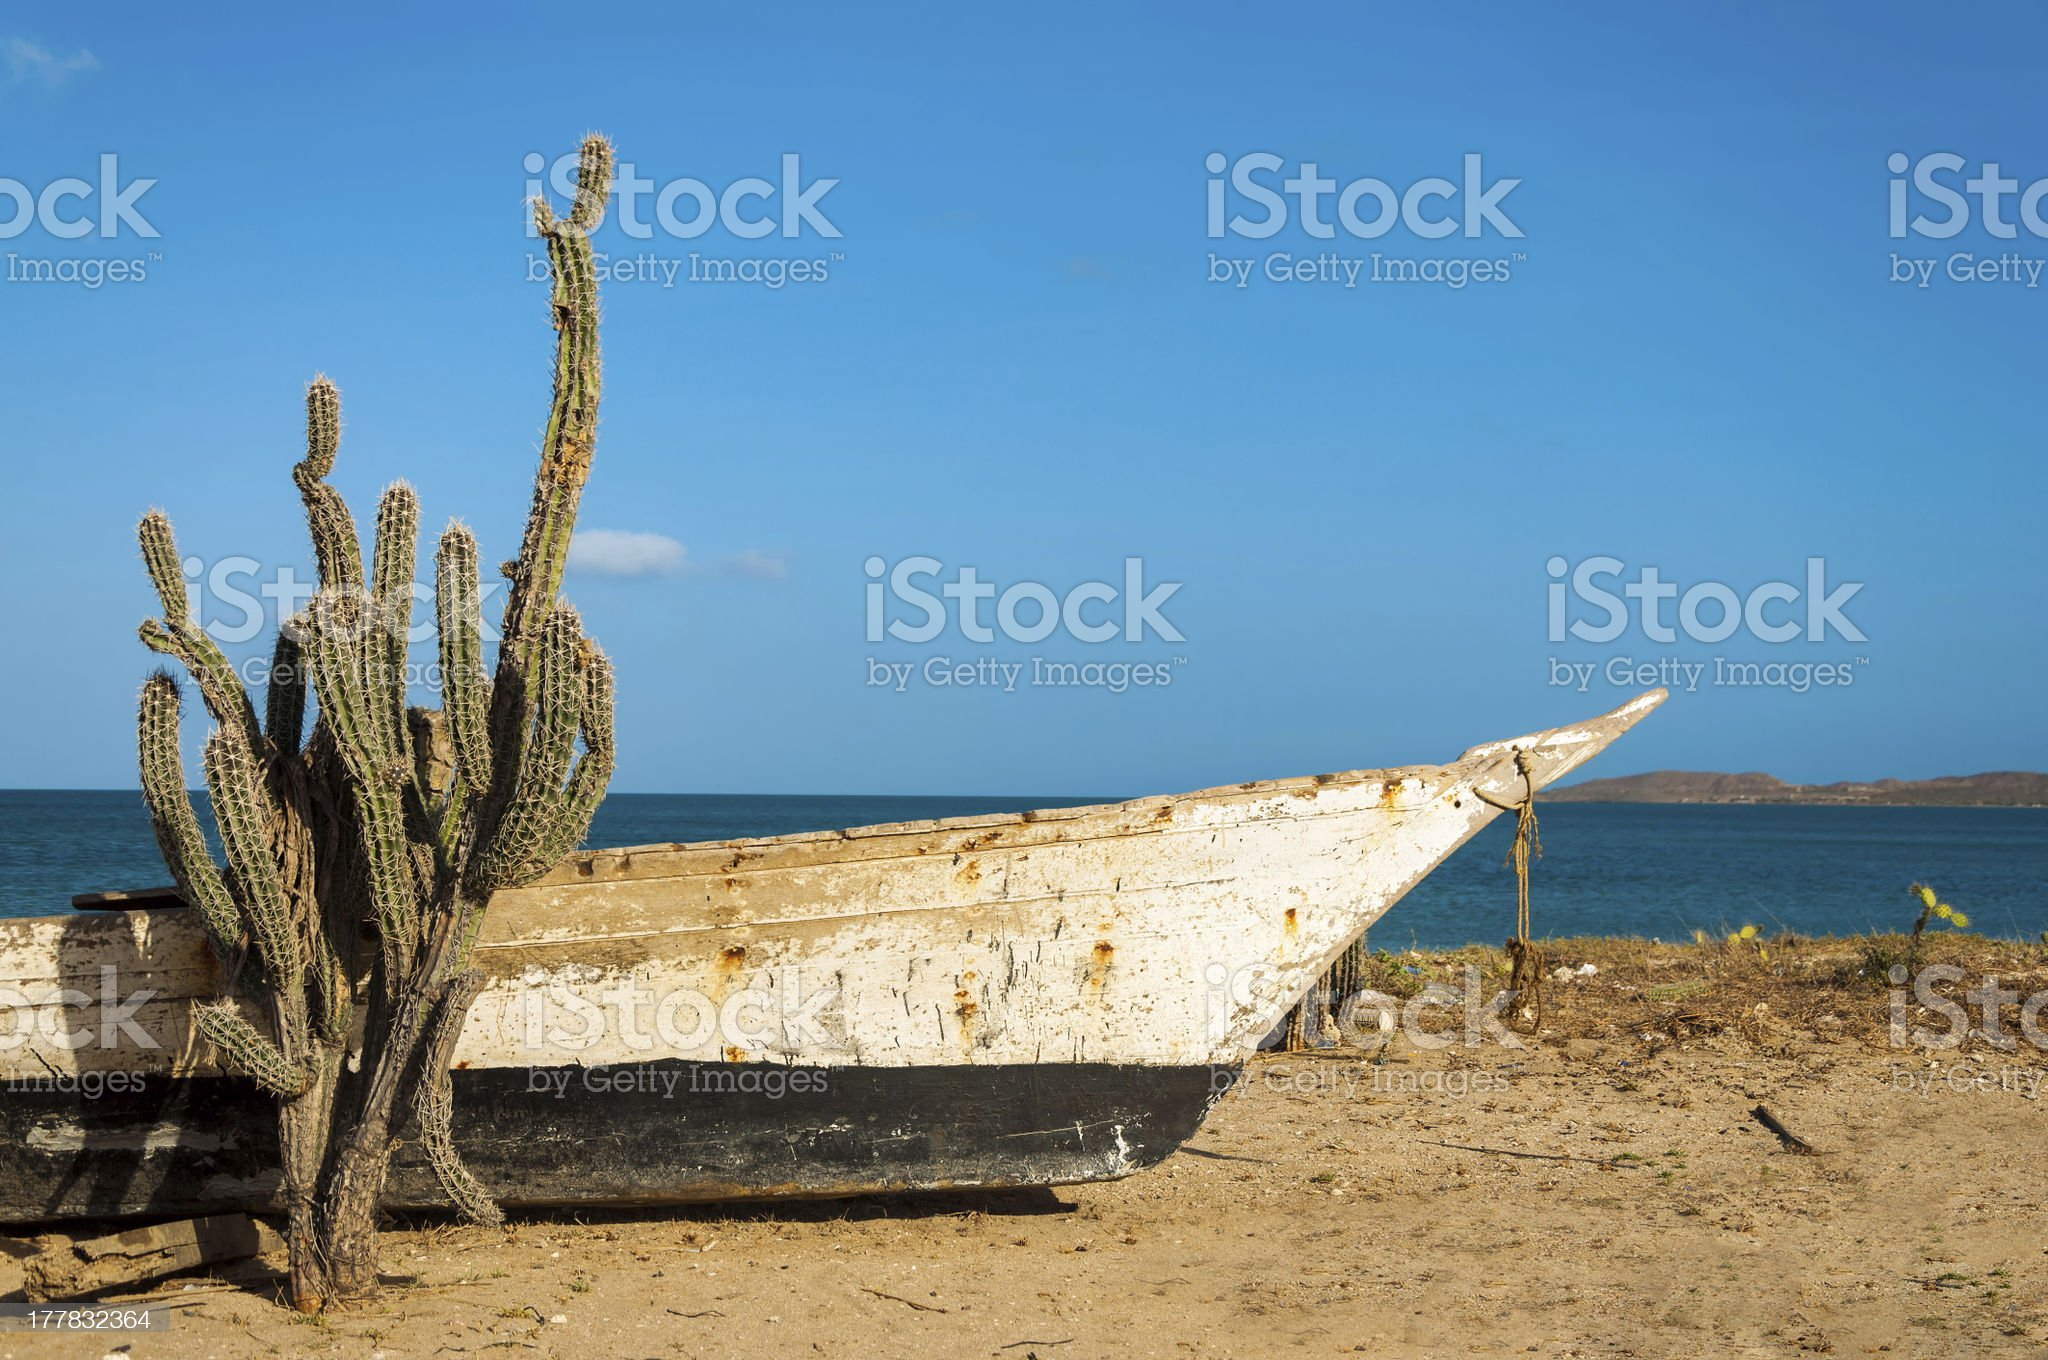 Cactus on a Beach royalty-free stock photo